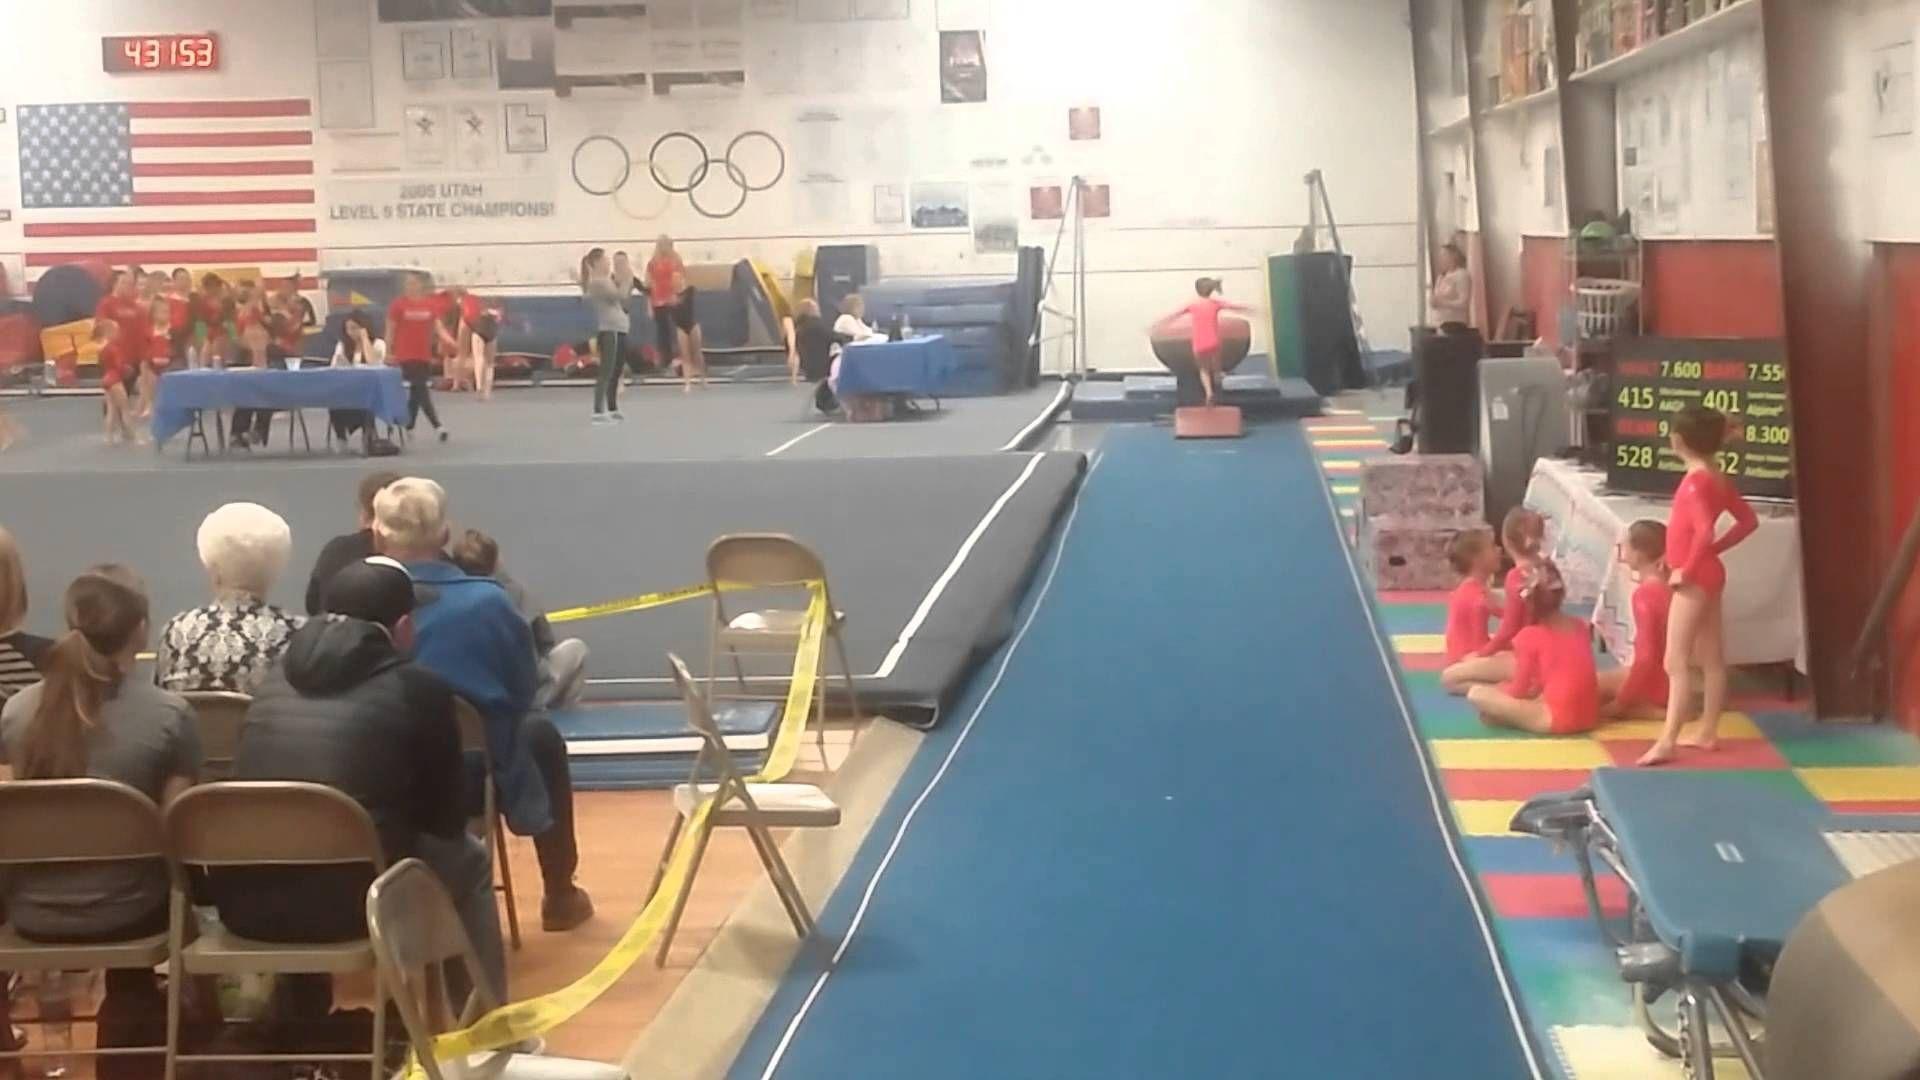 Savannah Usag Gymnastics Level Vault Routine